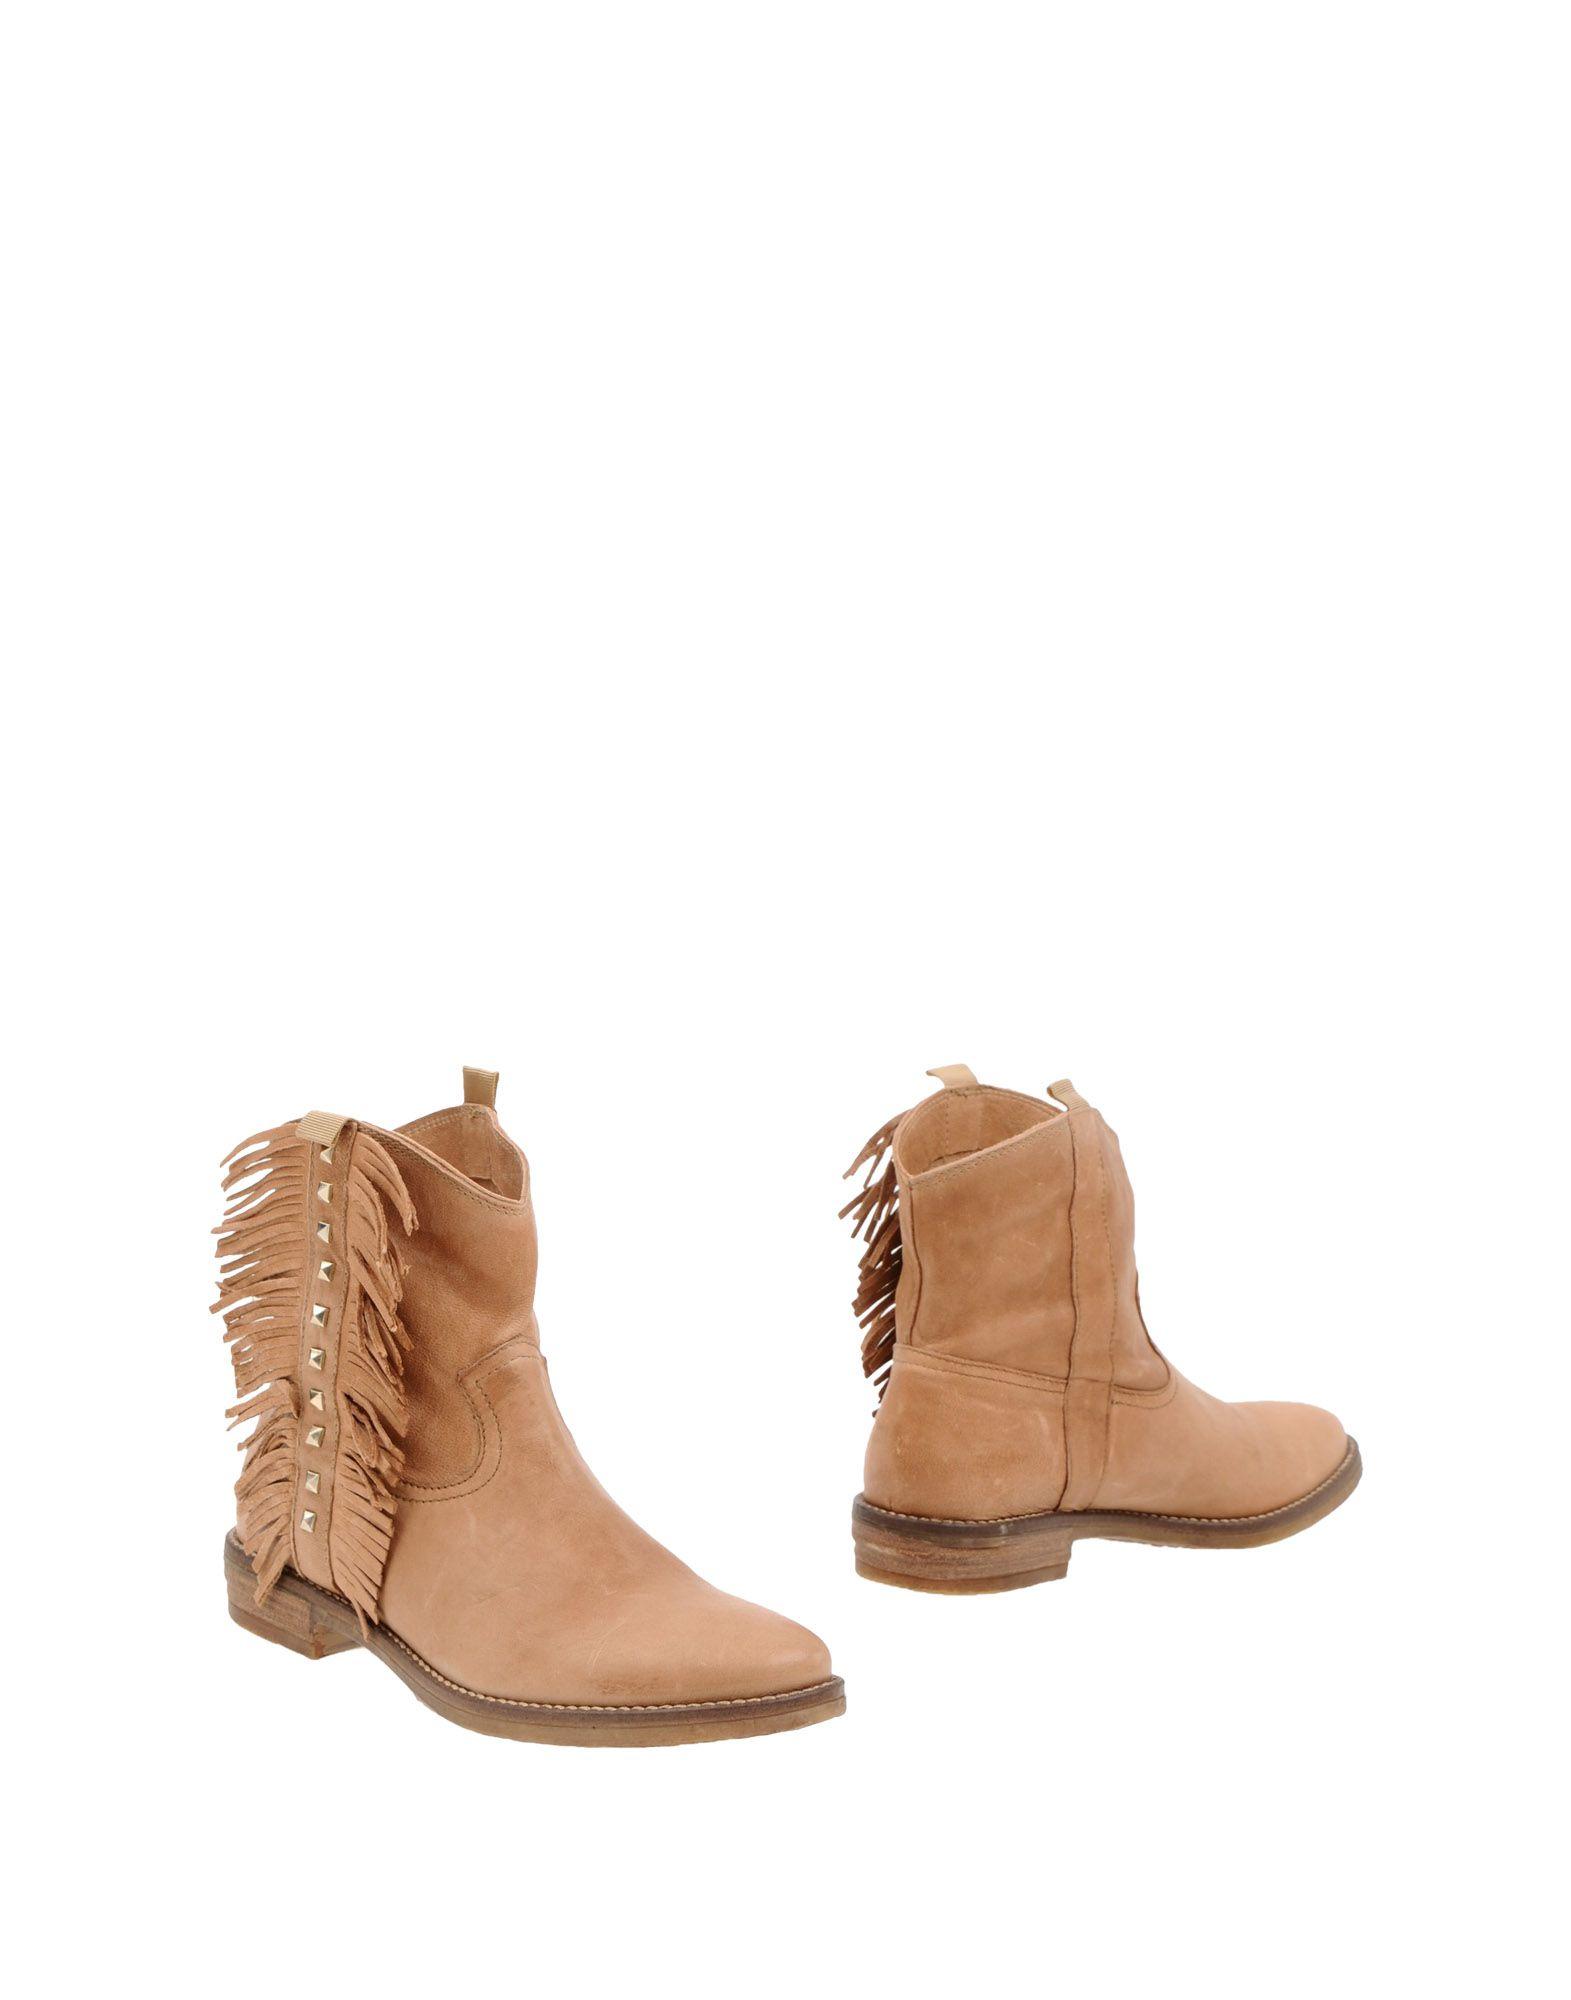 Florens Stiefelette Damen  11408809HE Gute Qualität beliebte Schuhe